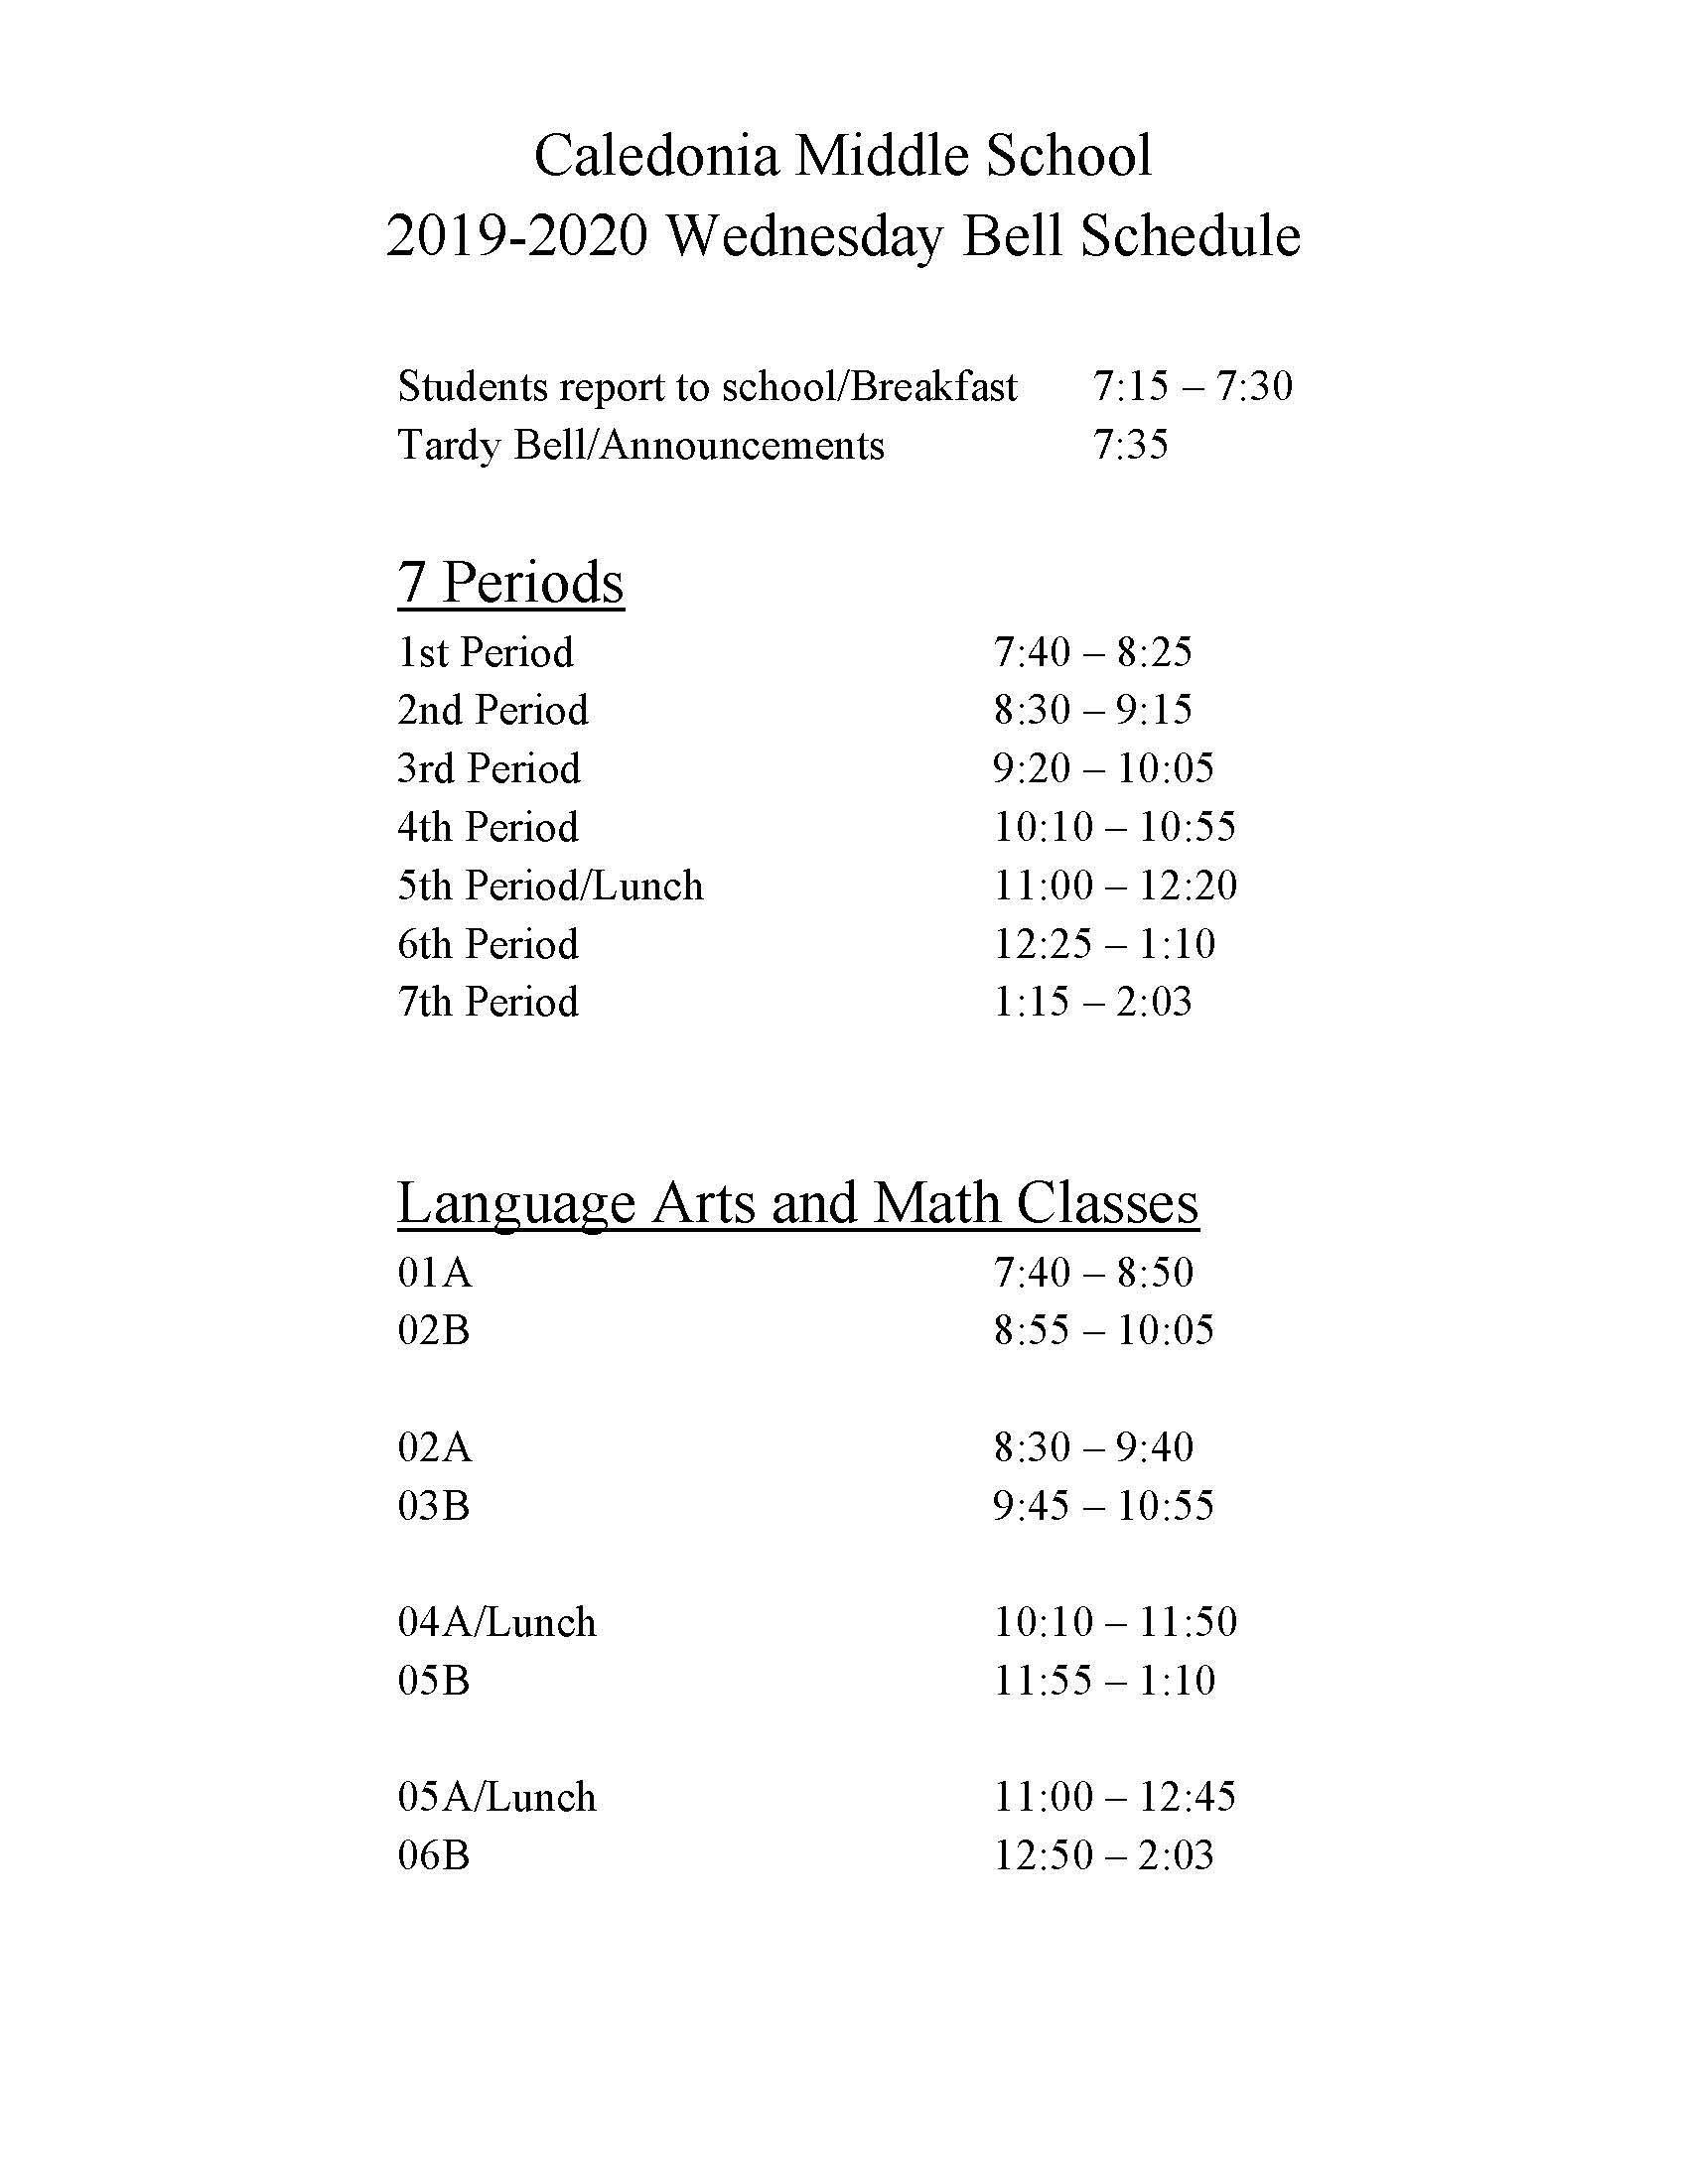 wednesday bell schedule